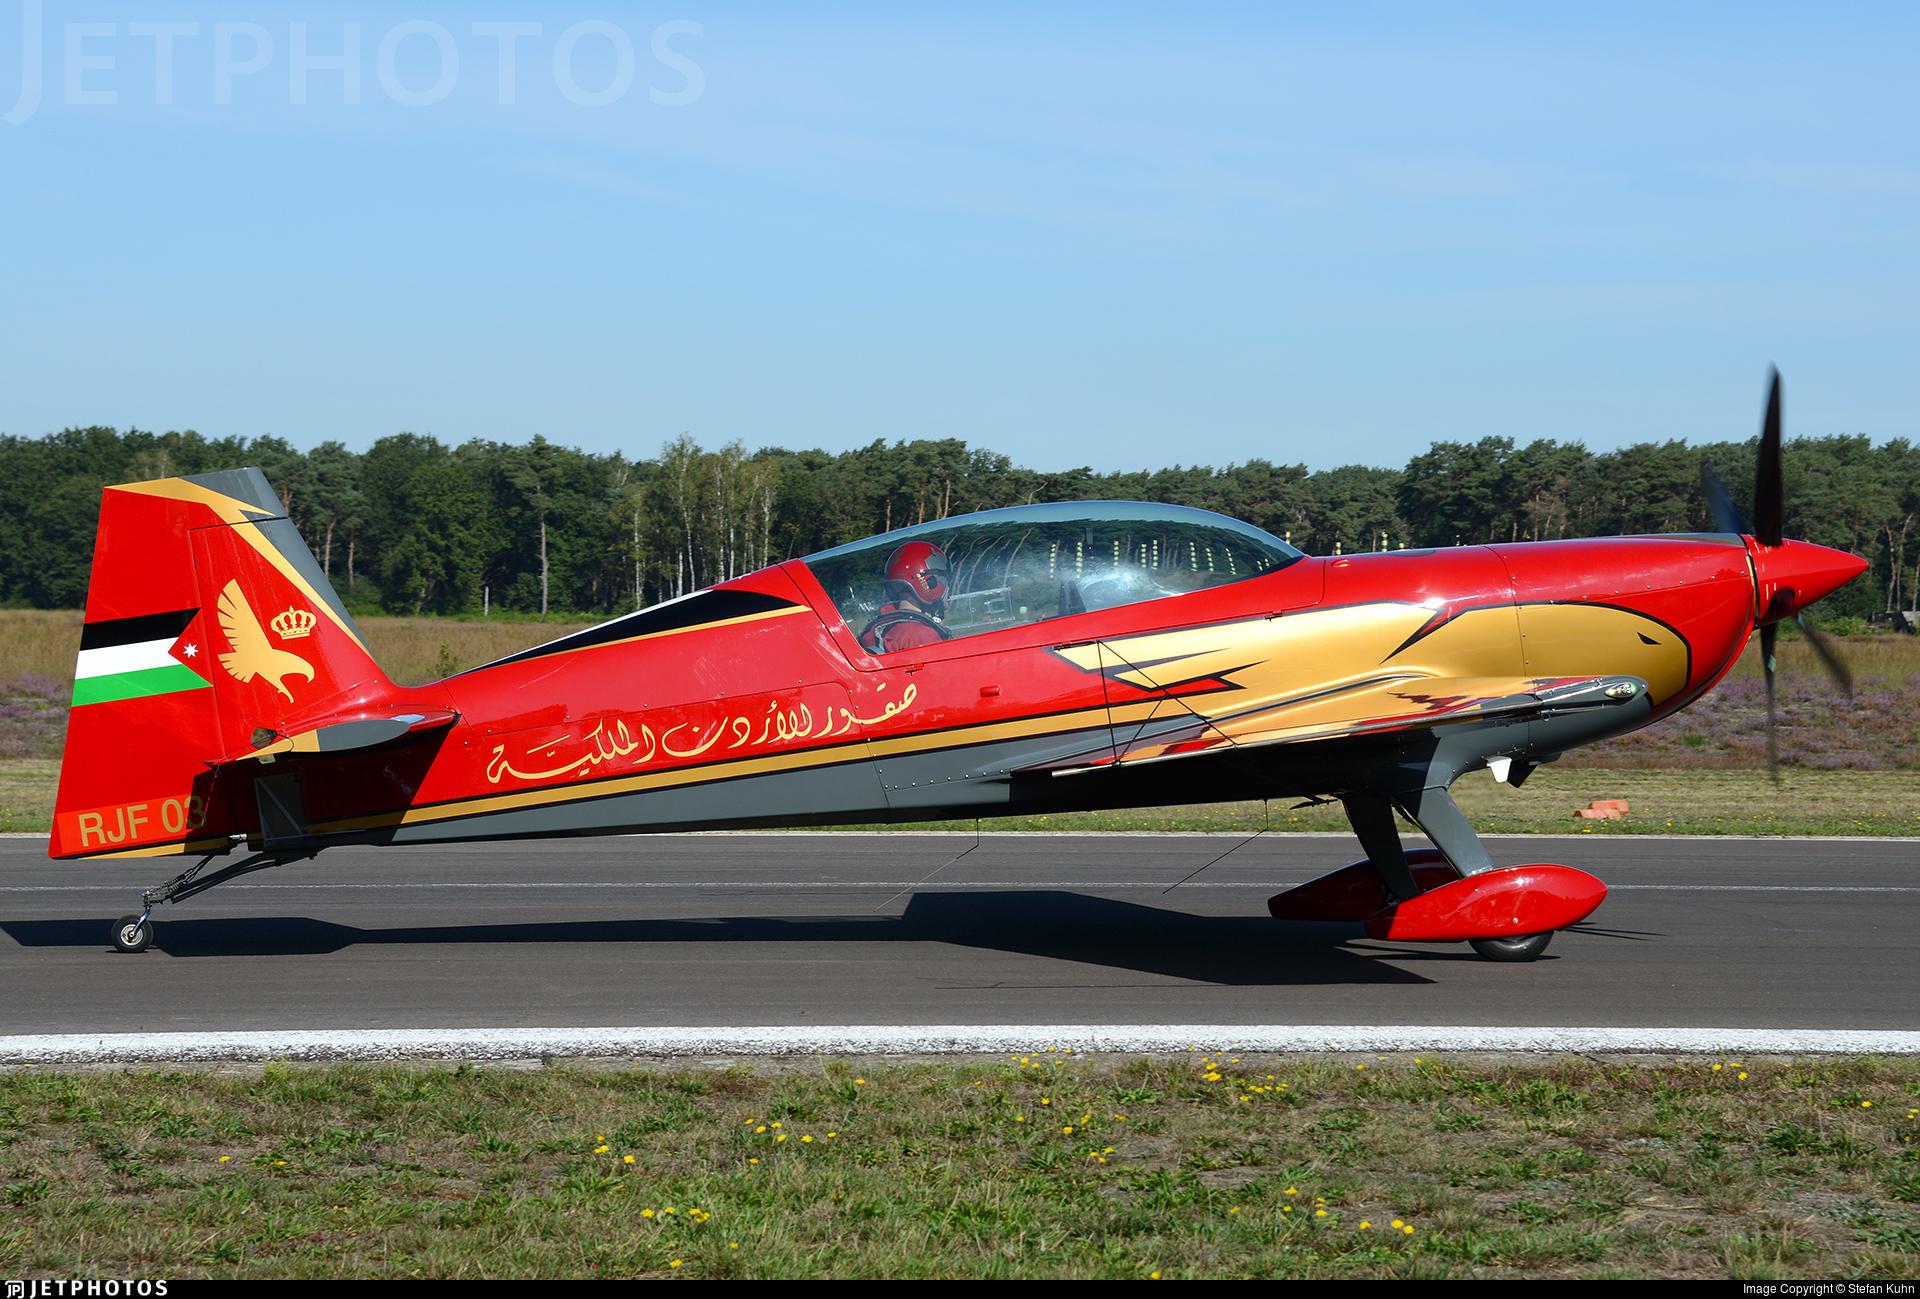 RJF 03 - Extra 330LX - Royal Jordanian Falcons